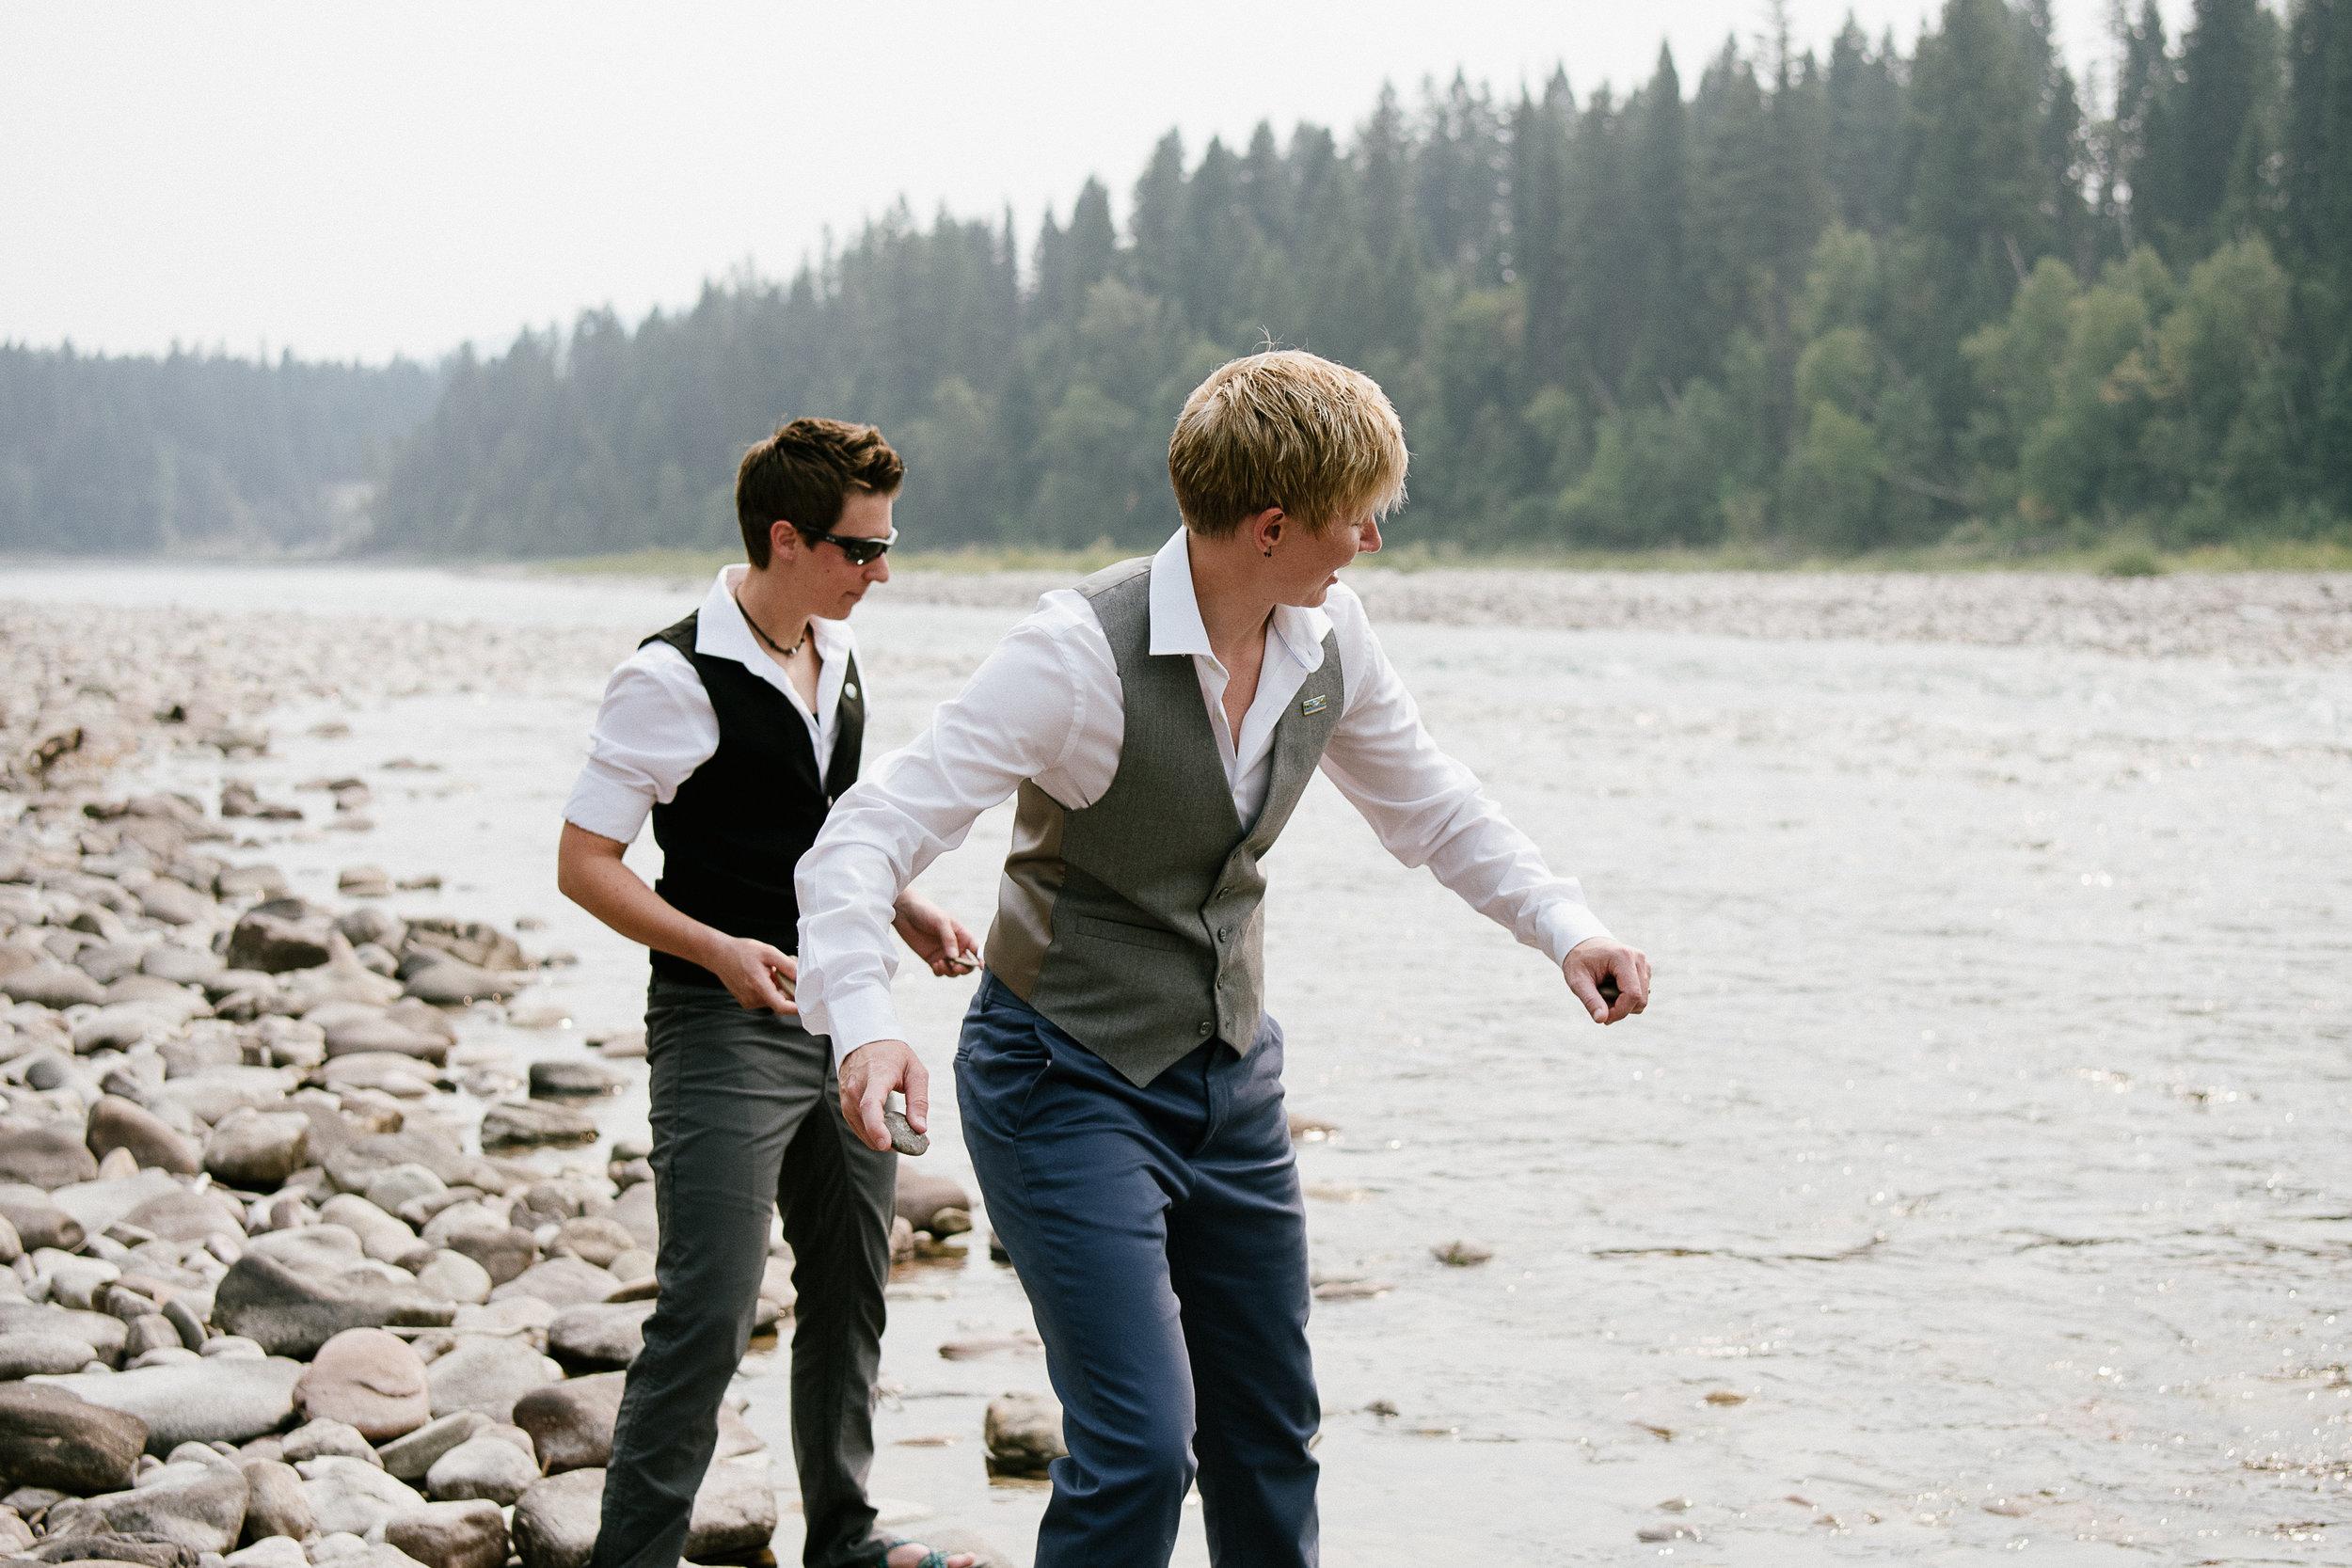 Glacier Montana Wedding_Elly Maurer + Frankie Dashiell Wedding_Beautiful Outdoor Wedding_Kelsey Lane Photography-5108.jpg